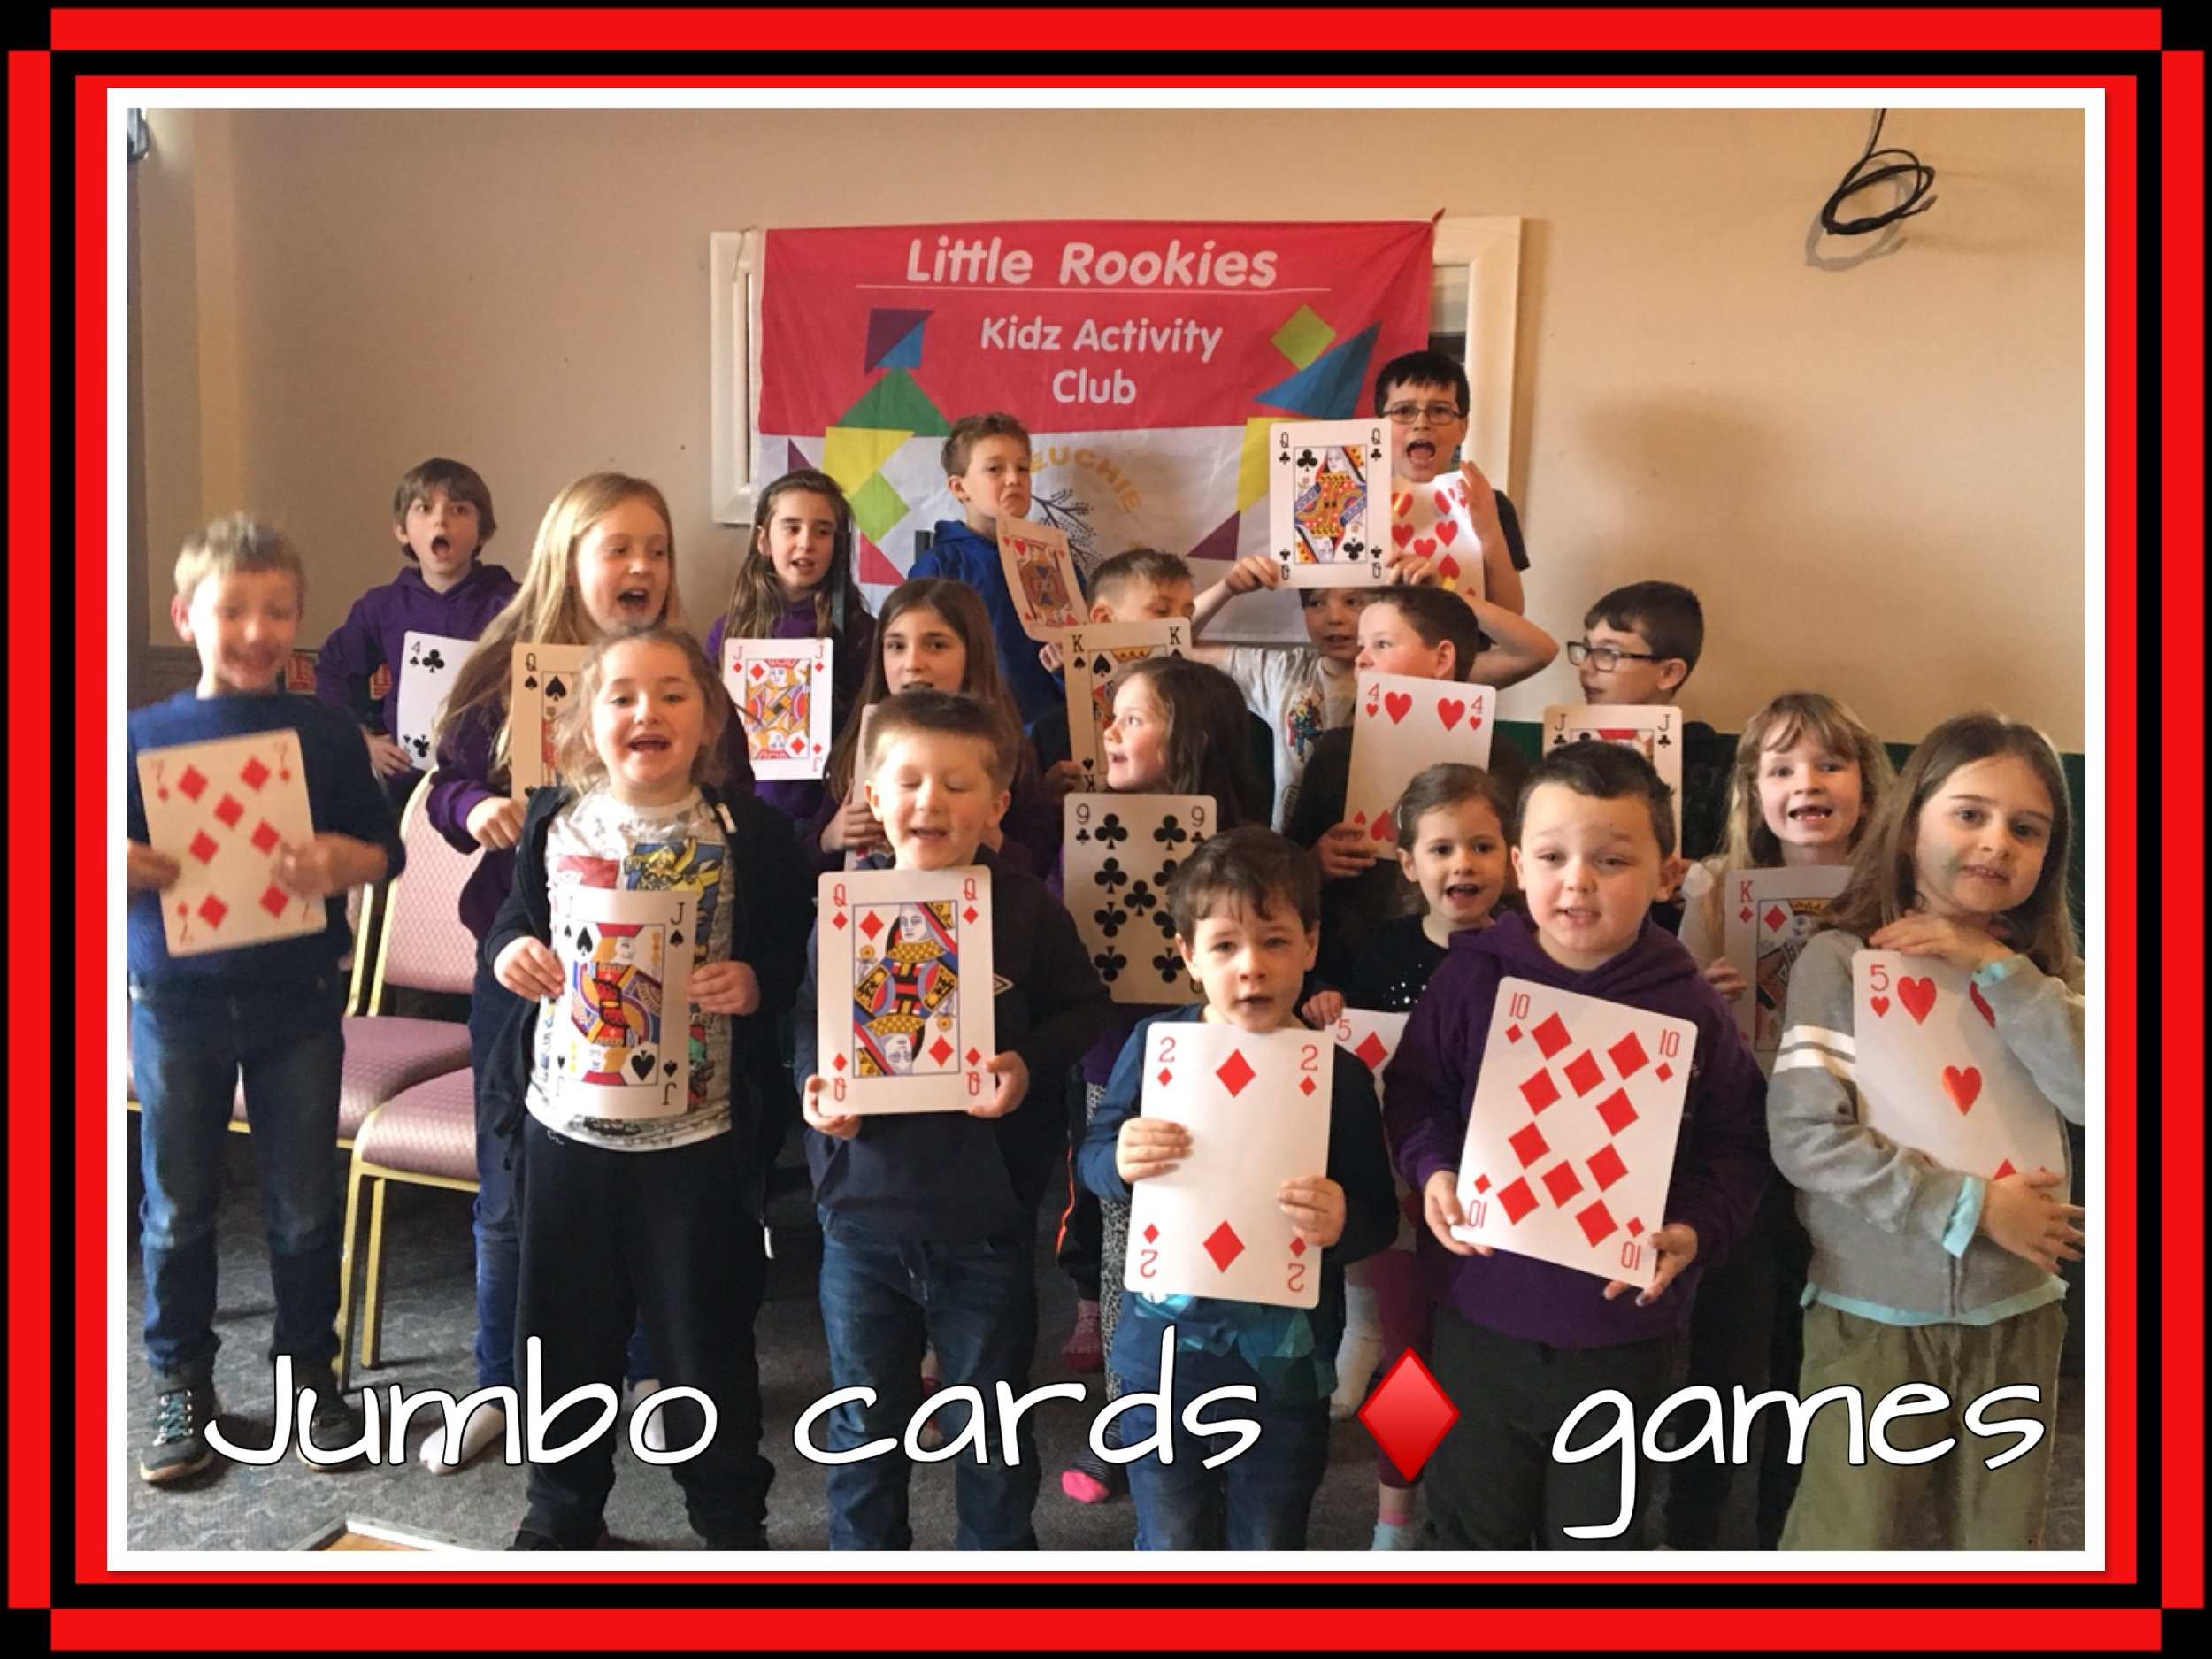 card games.JPG